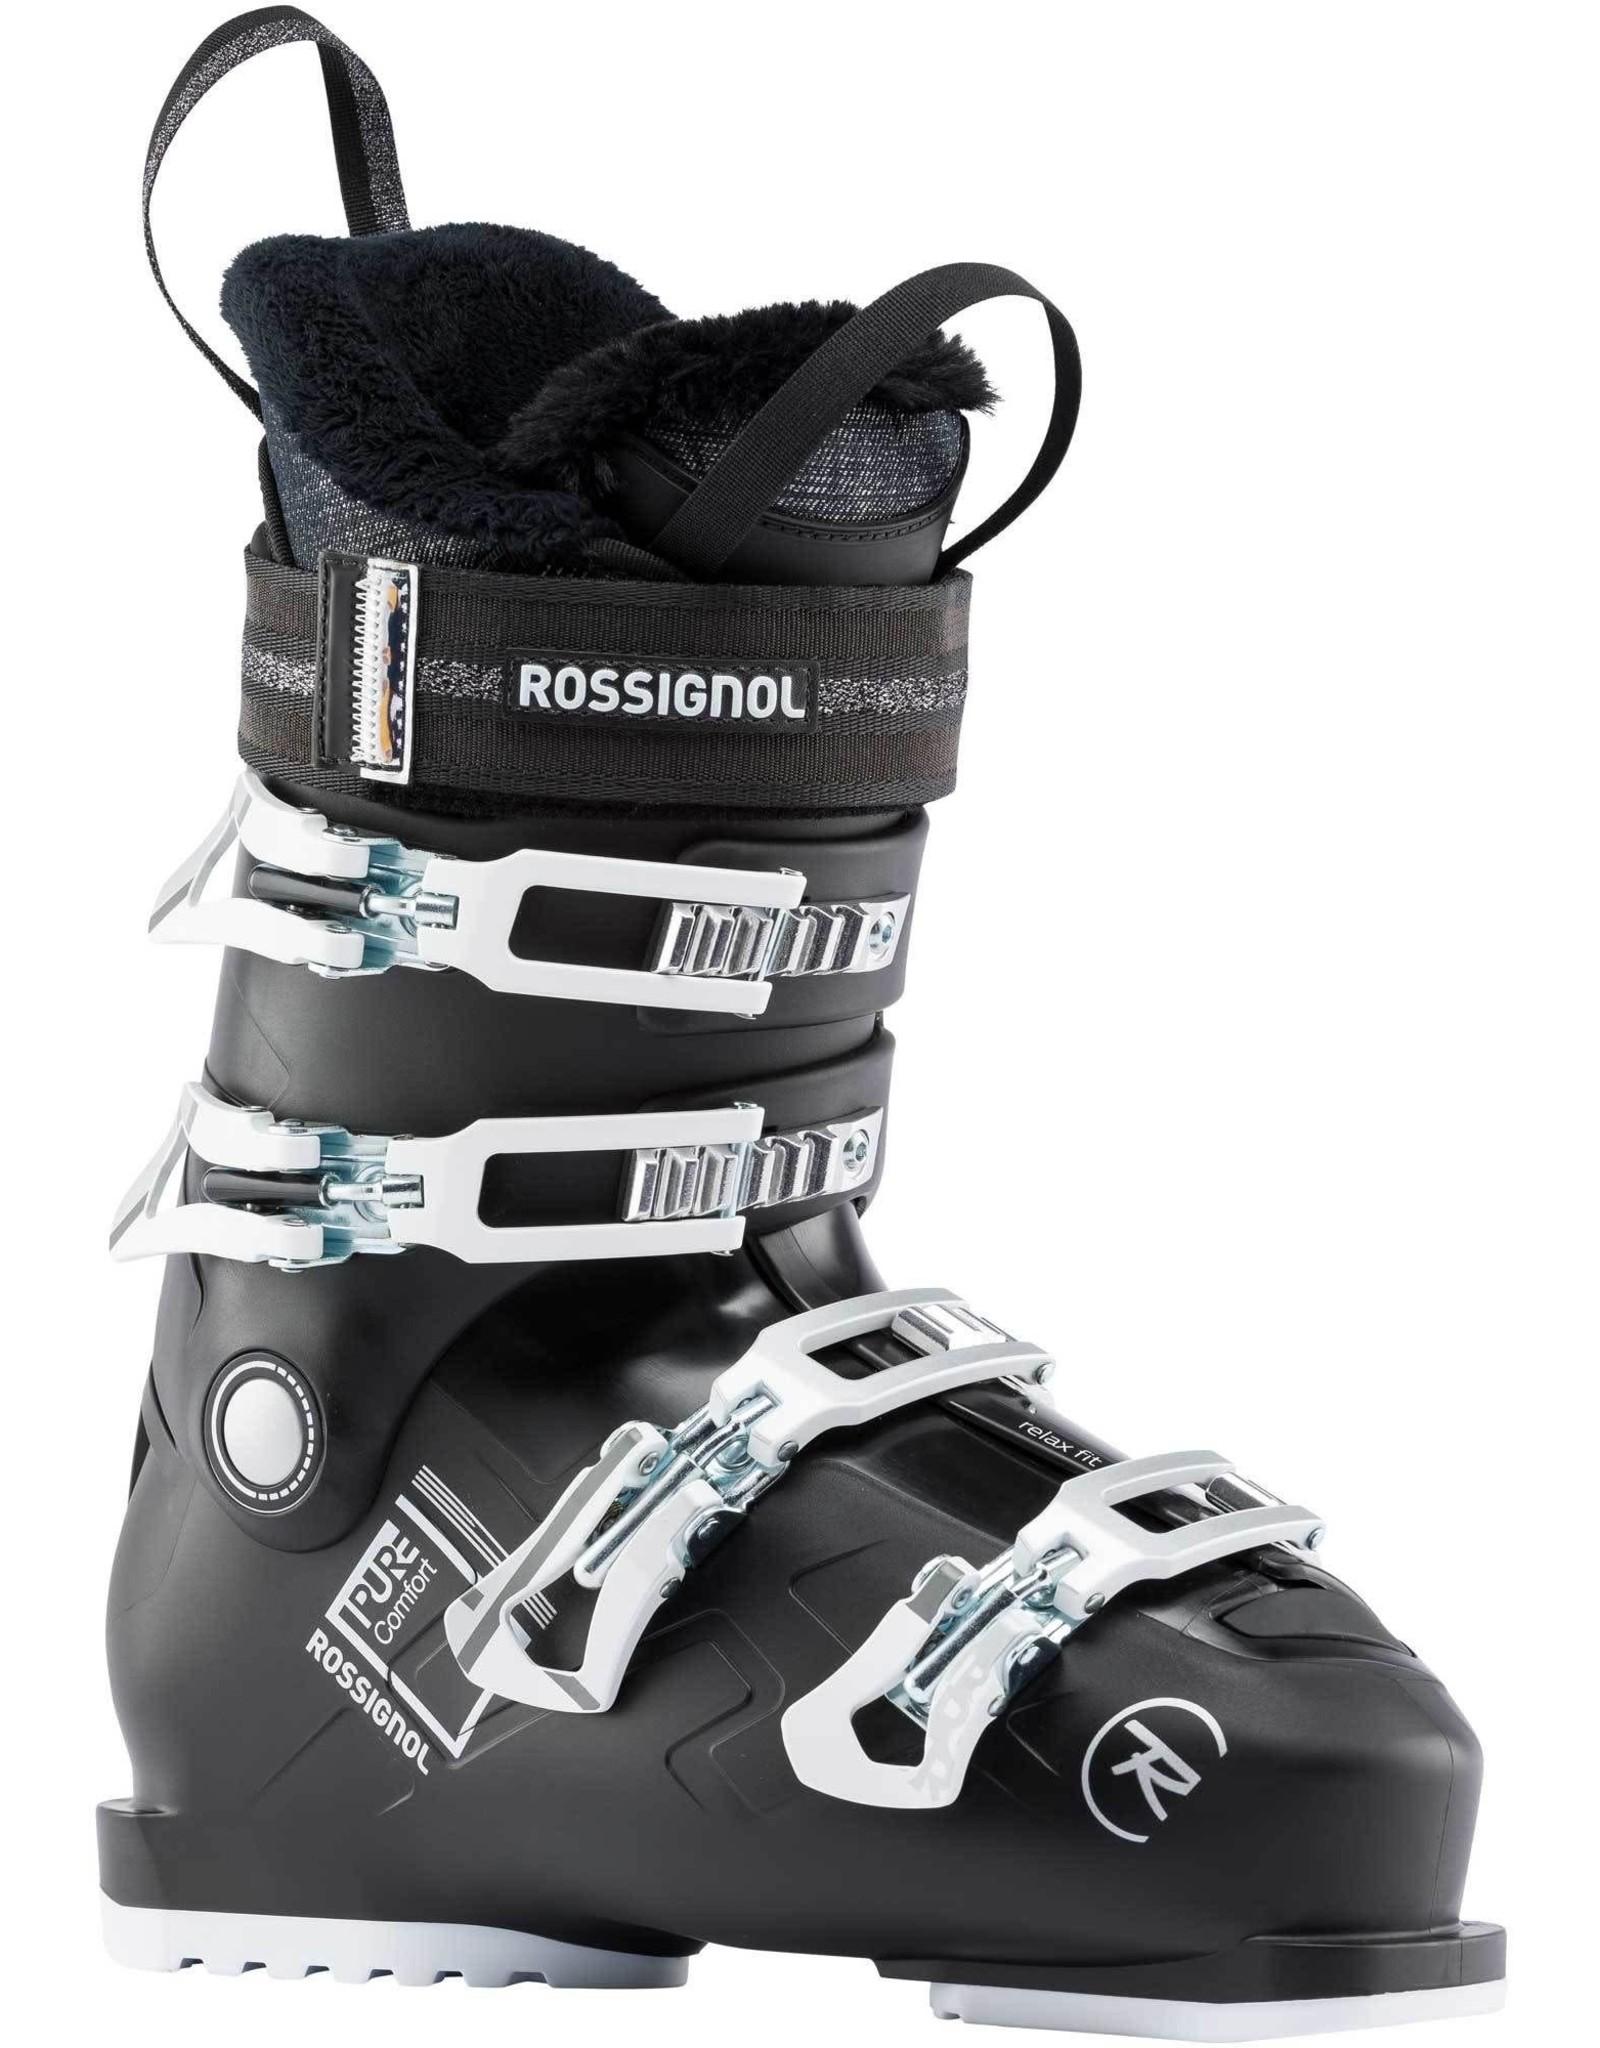 ROSSIGNOL ROSSIGNOL PURE CONFORT 60 BLACK ALPINE SKI BOOT SR 20